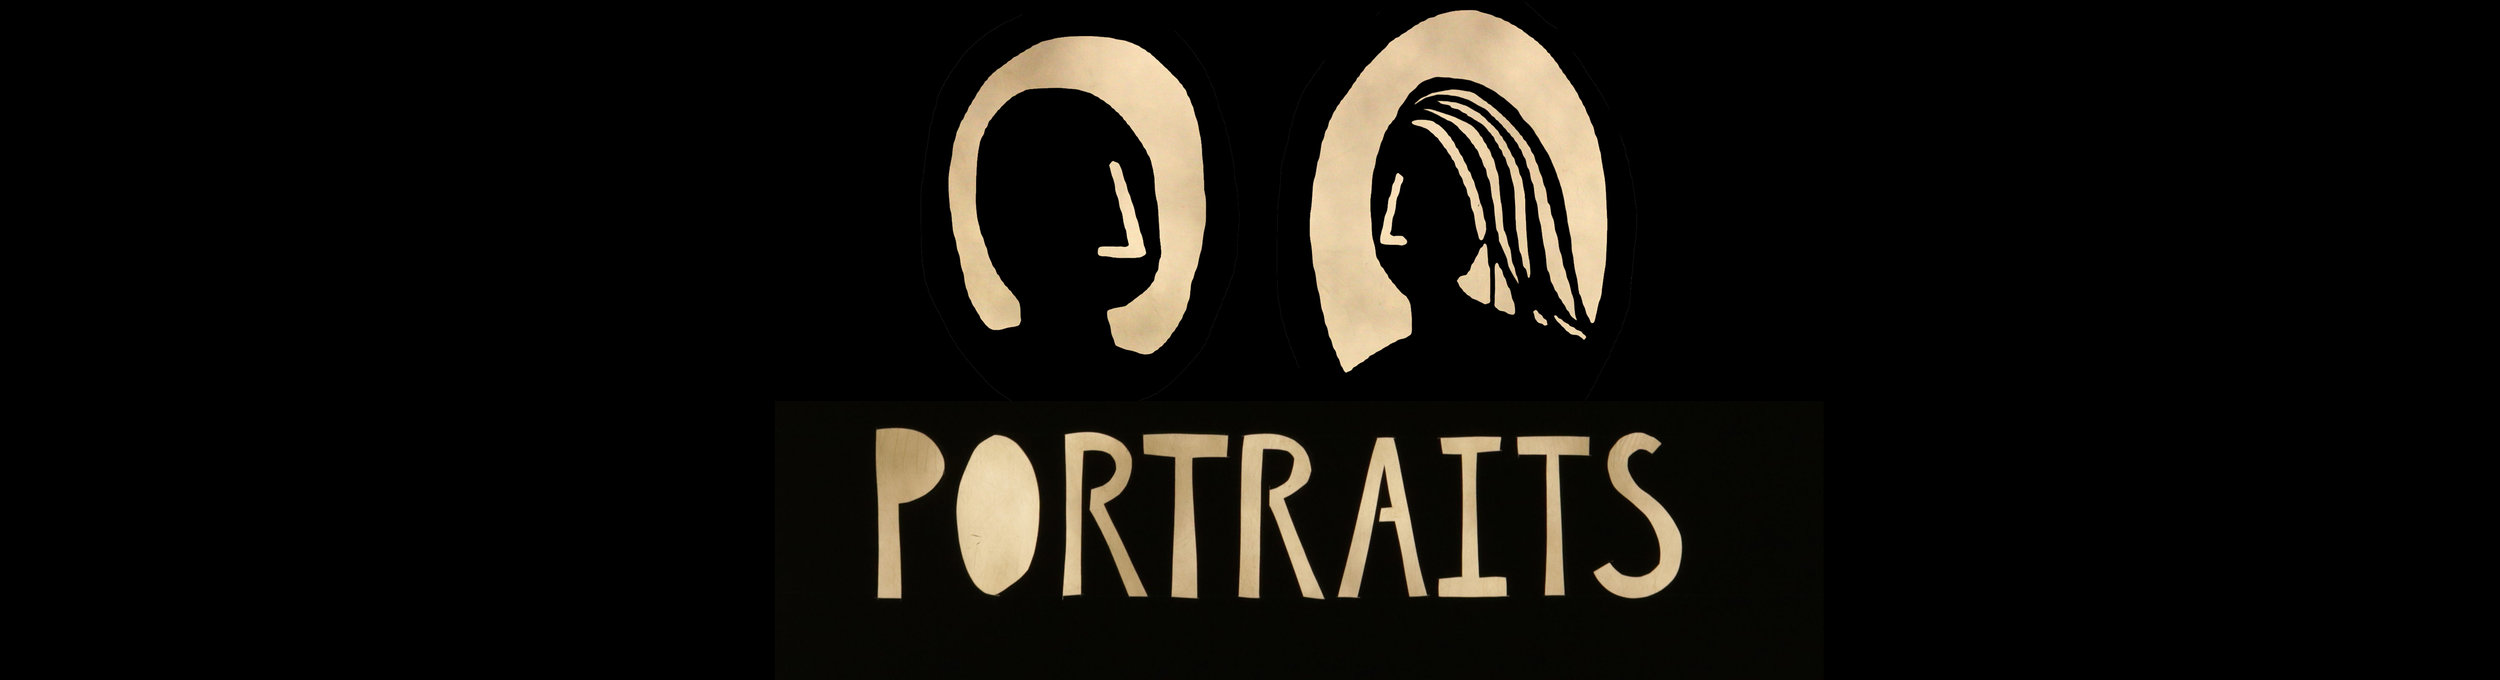 Portraits logo.jpg